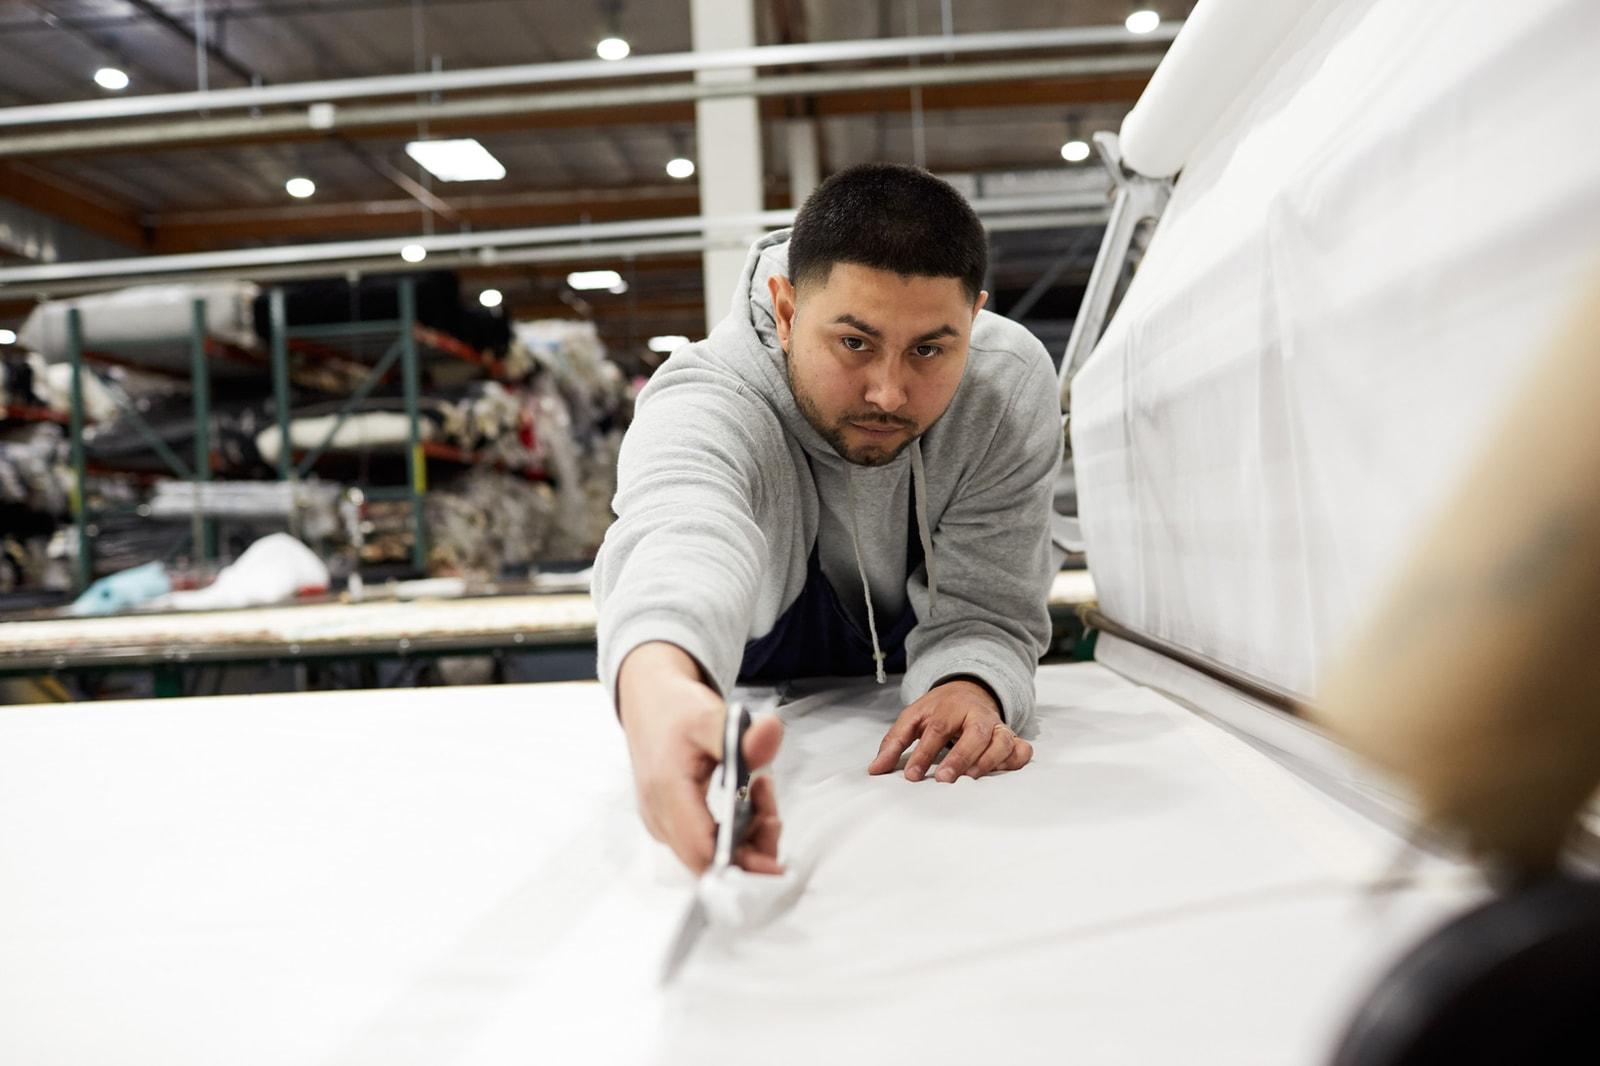 Reformation Factory Yael Aflalo